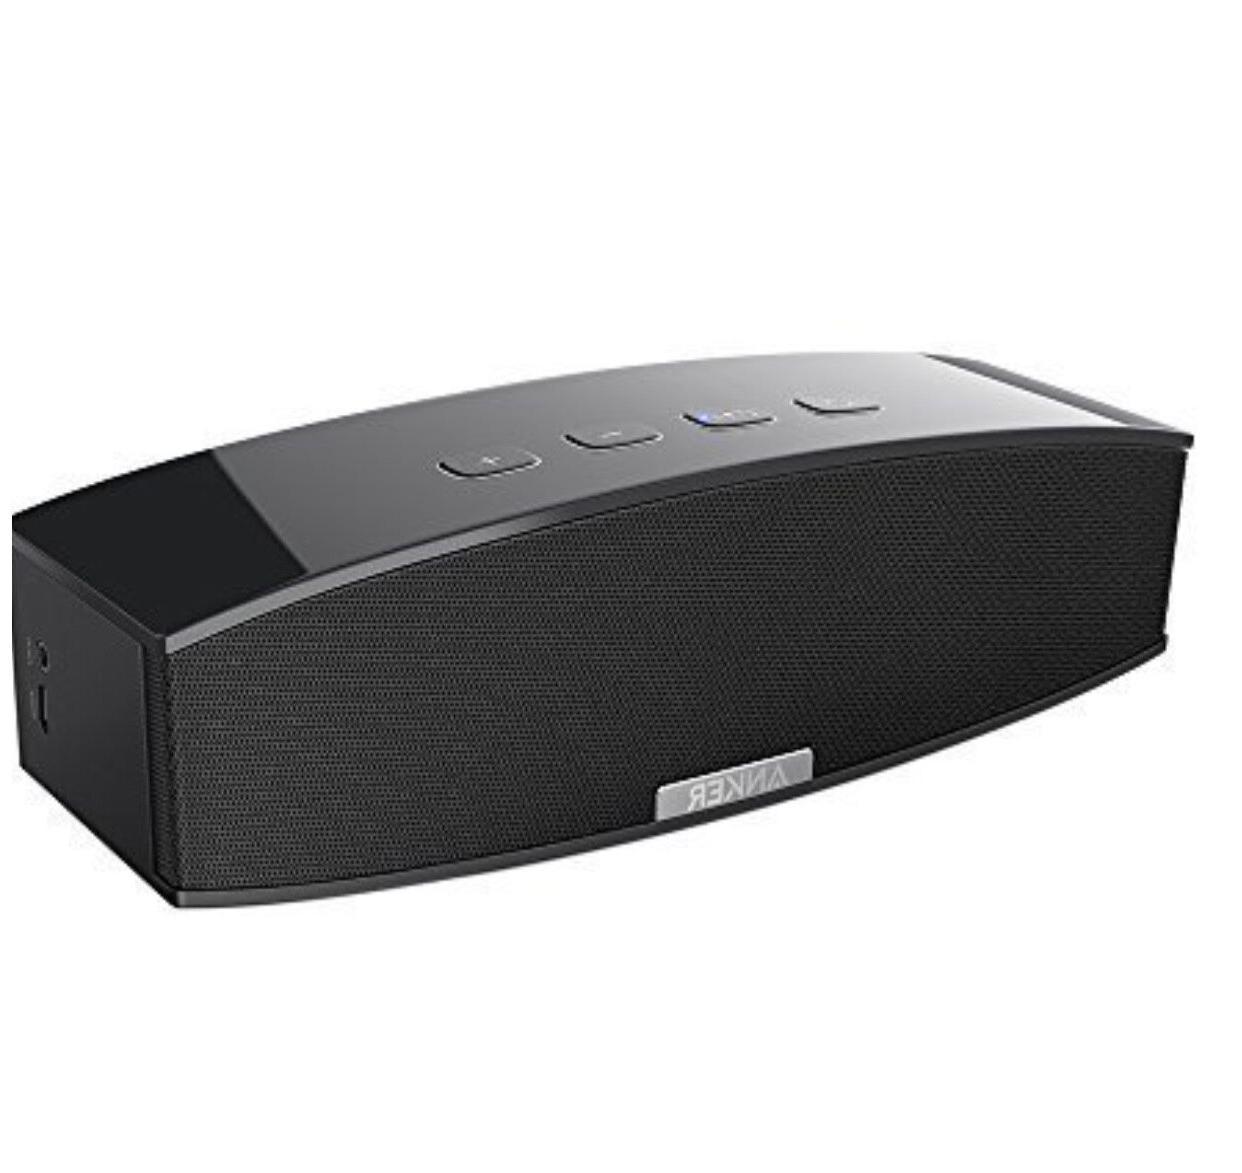 Anker 20W Premium Stereo Bluetooth Portable Speaker with Dua